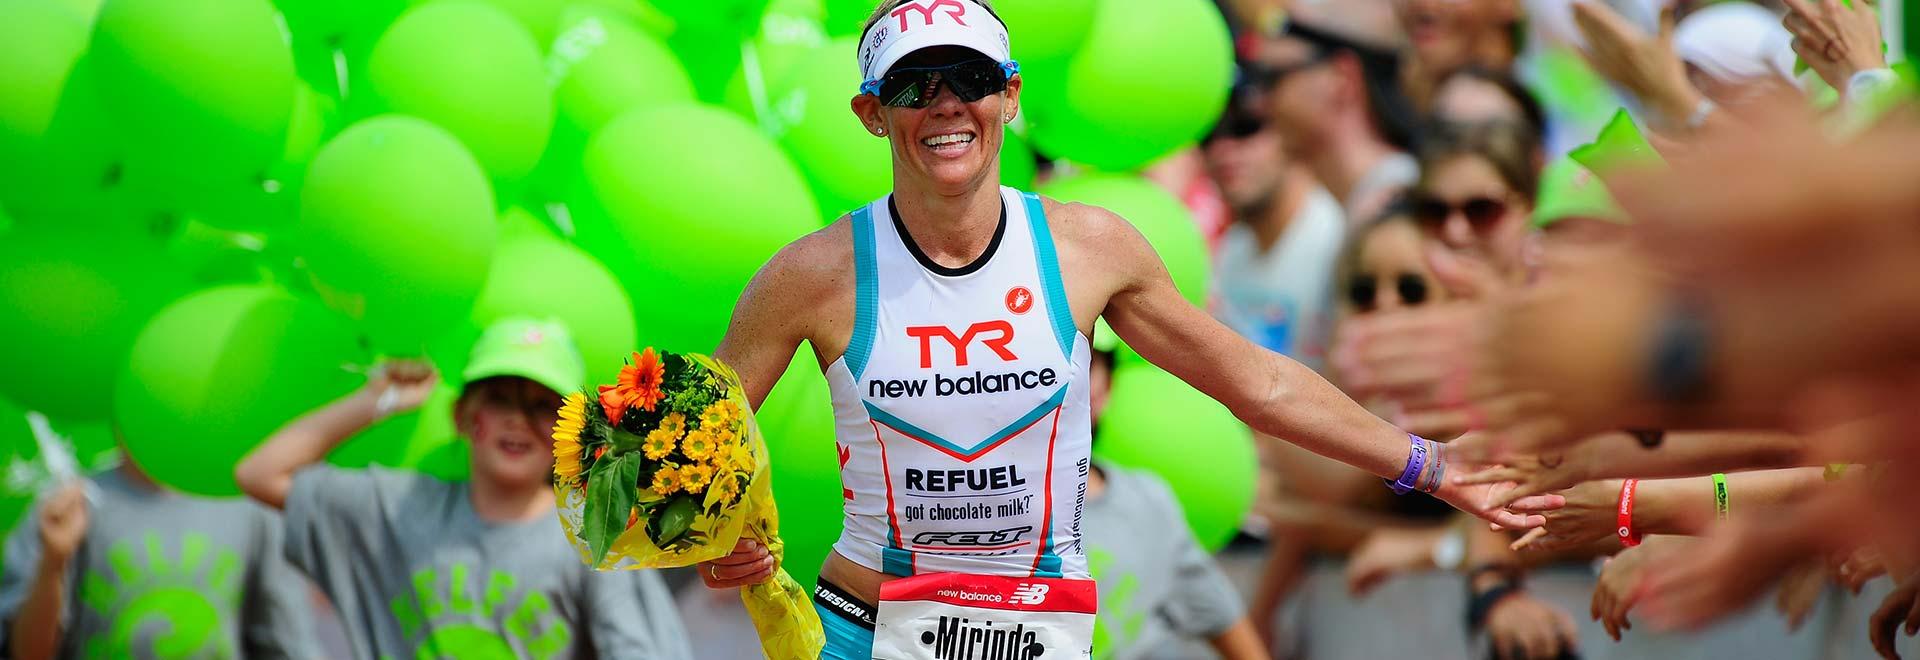 Mirinda Carfrae World Champion Triathlete Husqvarna Fs 400 Lv Economic De2 Profile